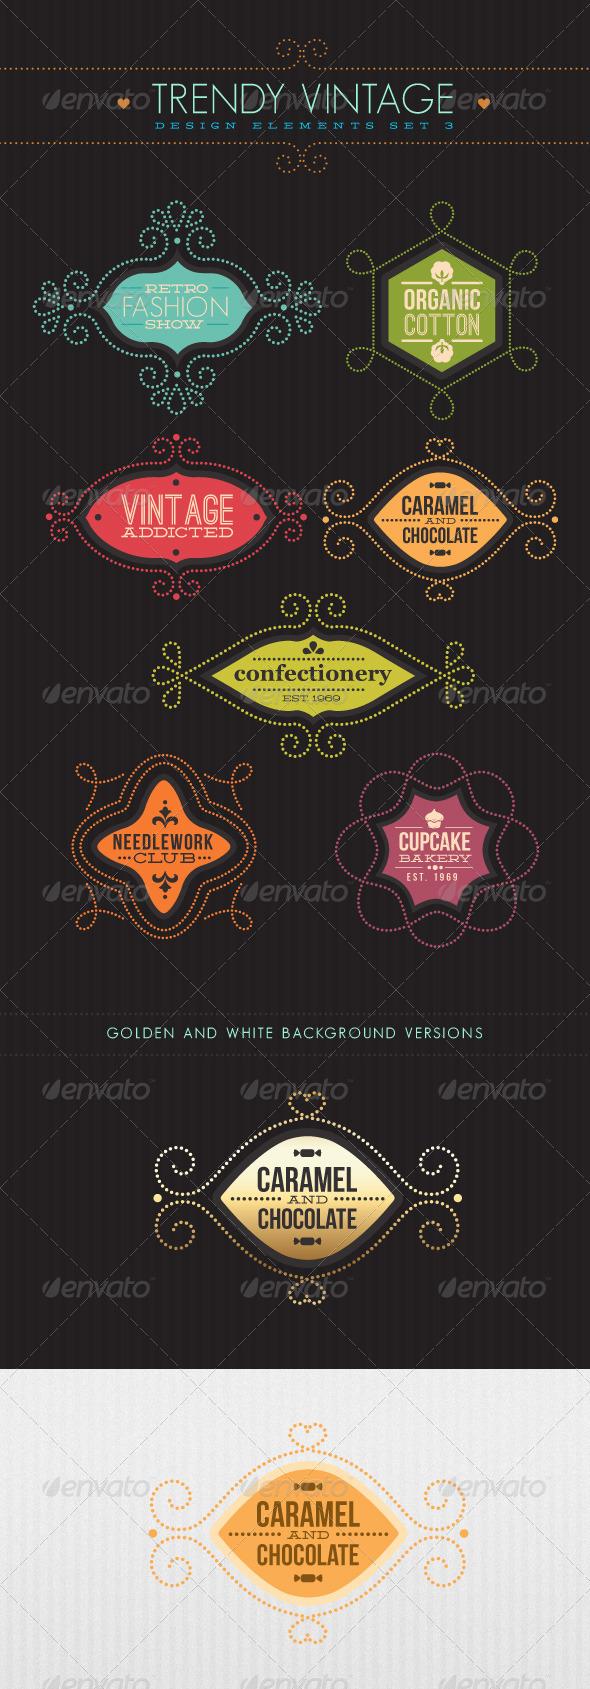 Trendy Vintage Vector Design Elements Set 3 - Flourishes / Swirls Decorative